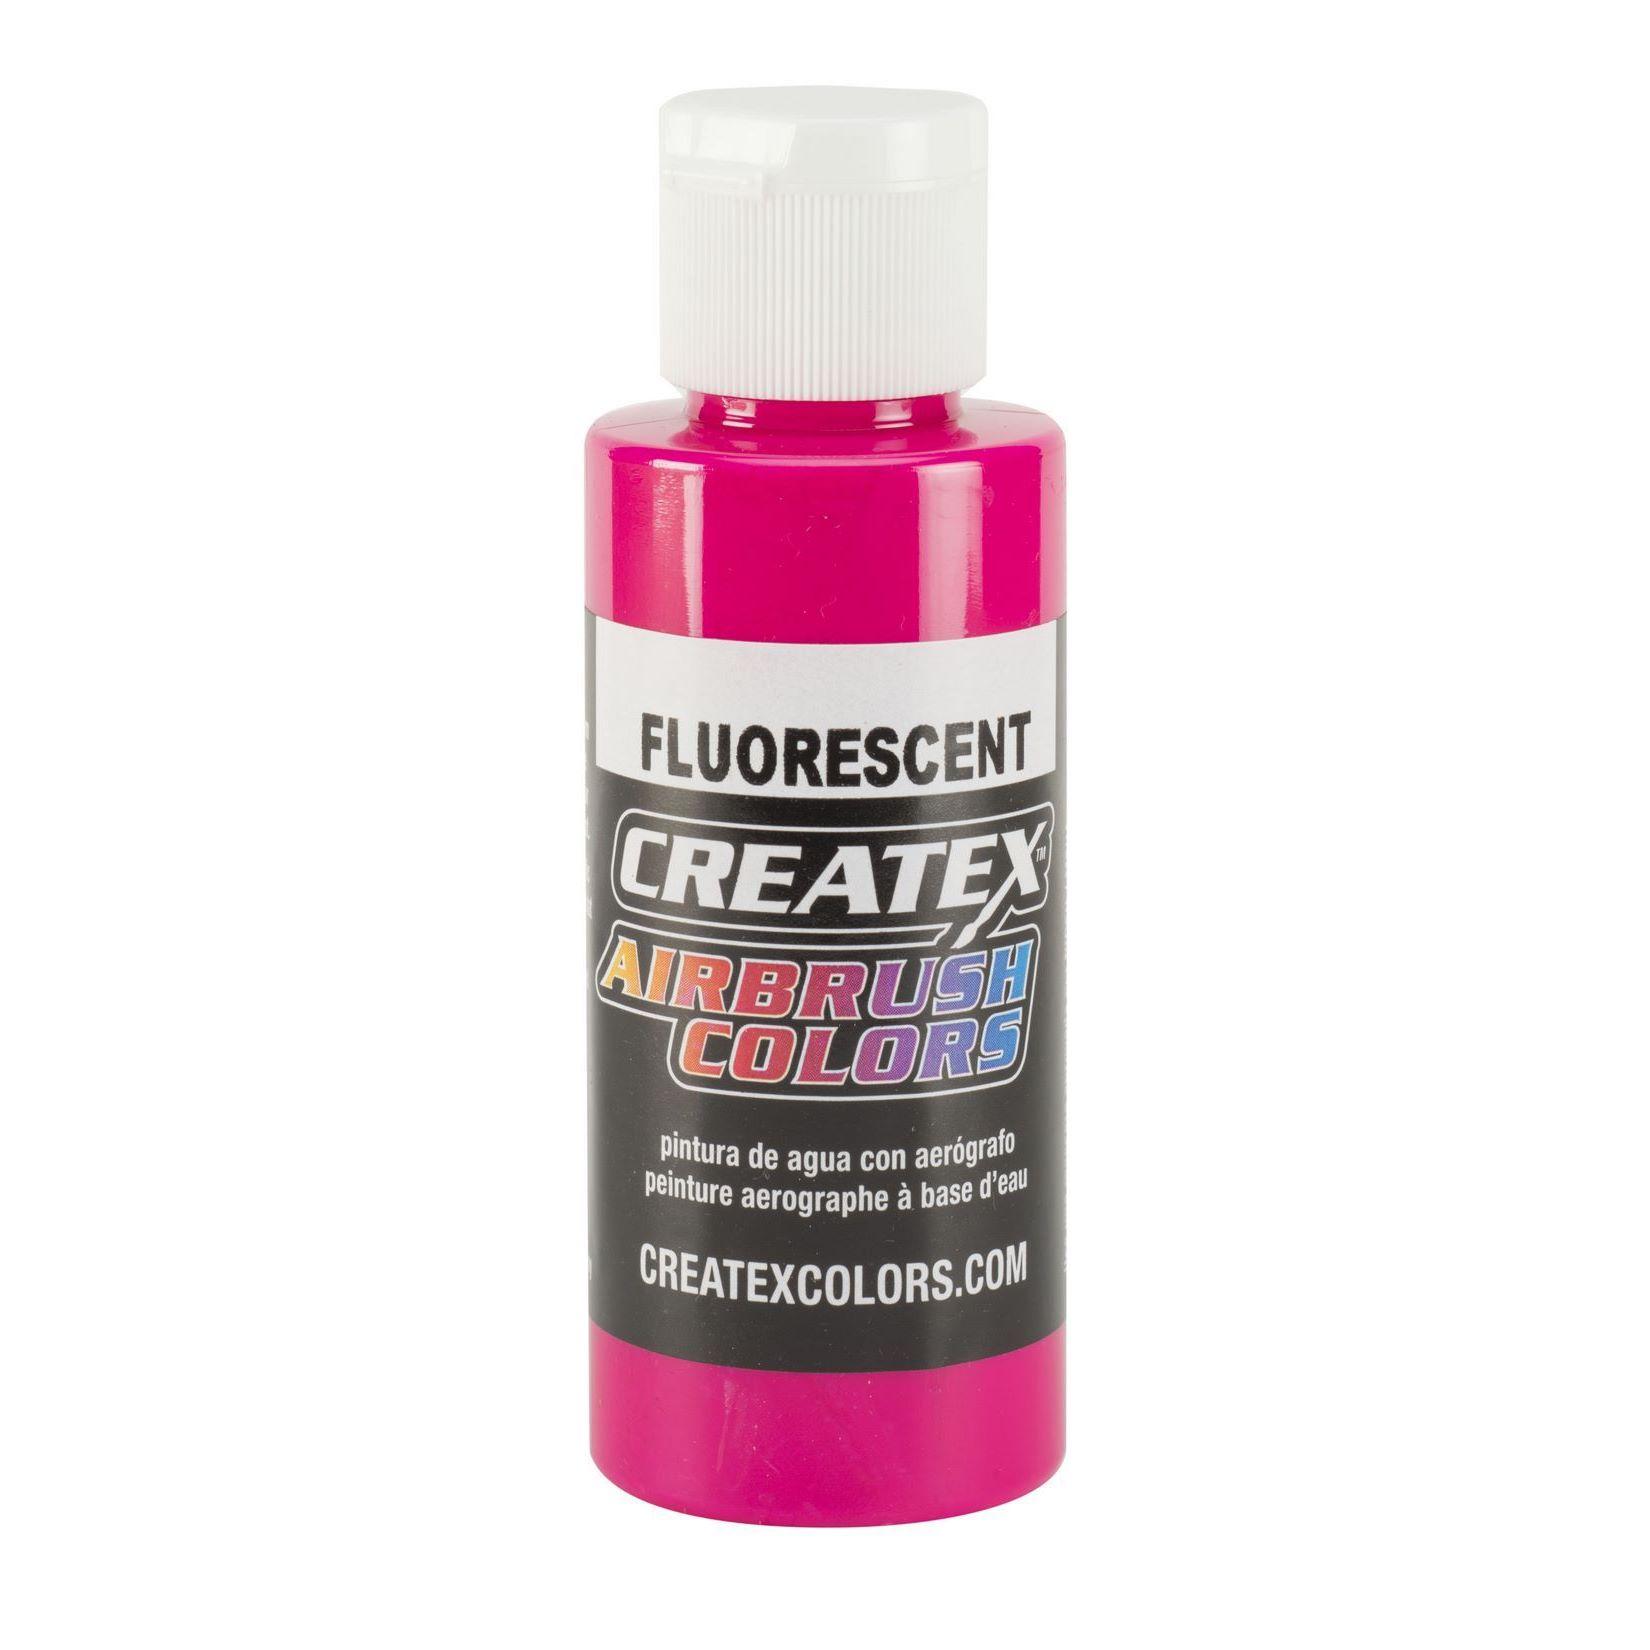 fluorescent magenta Createx Airbrush Colors Farbe 60ml 11 5406 Createx